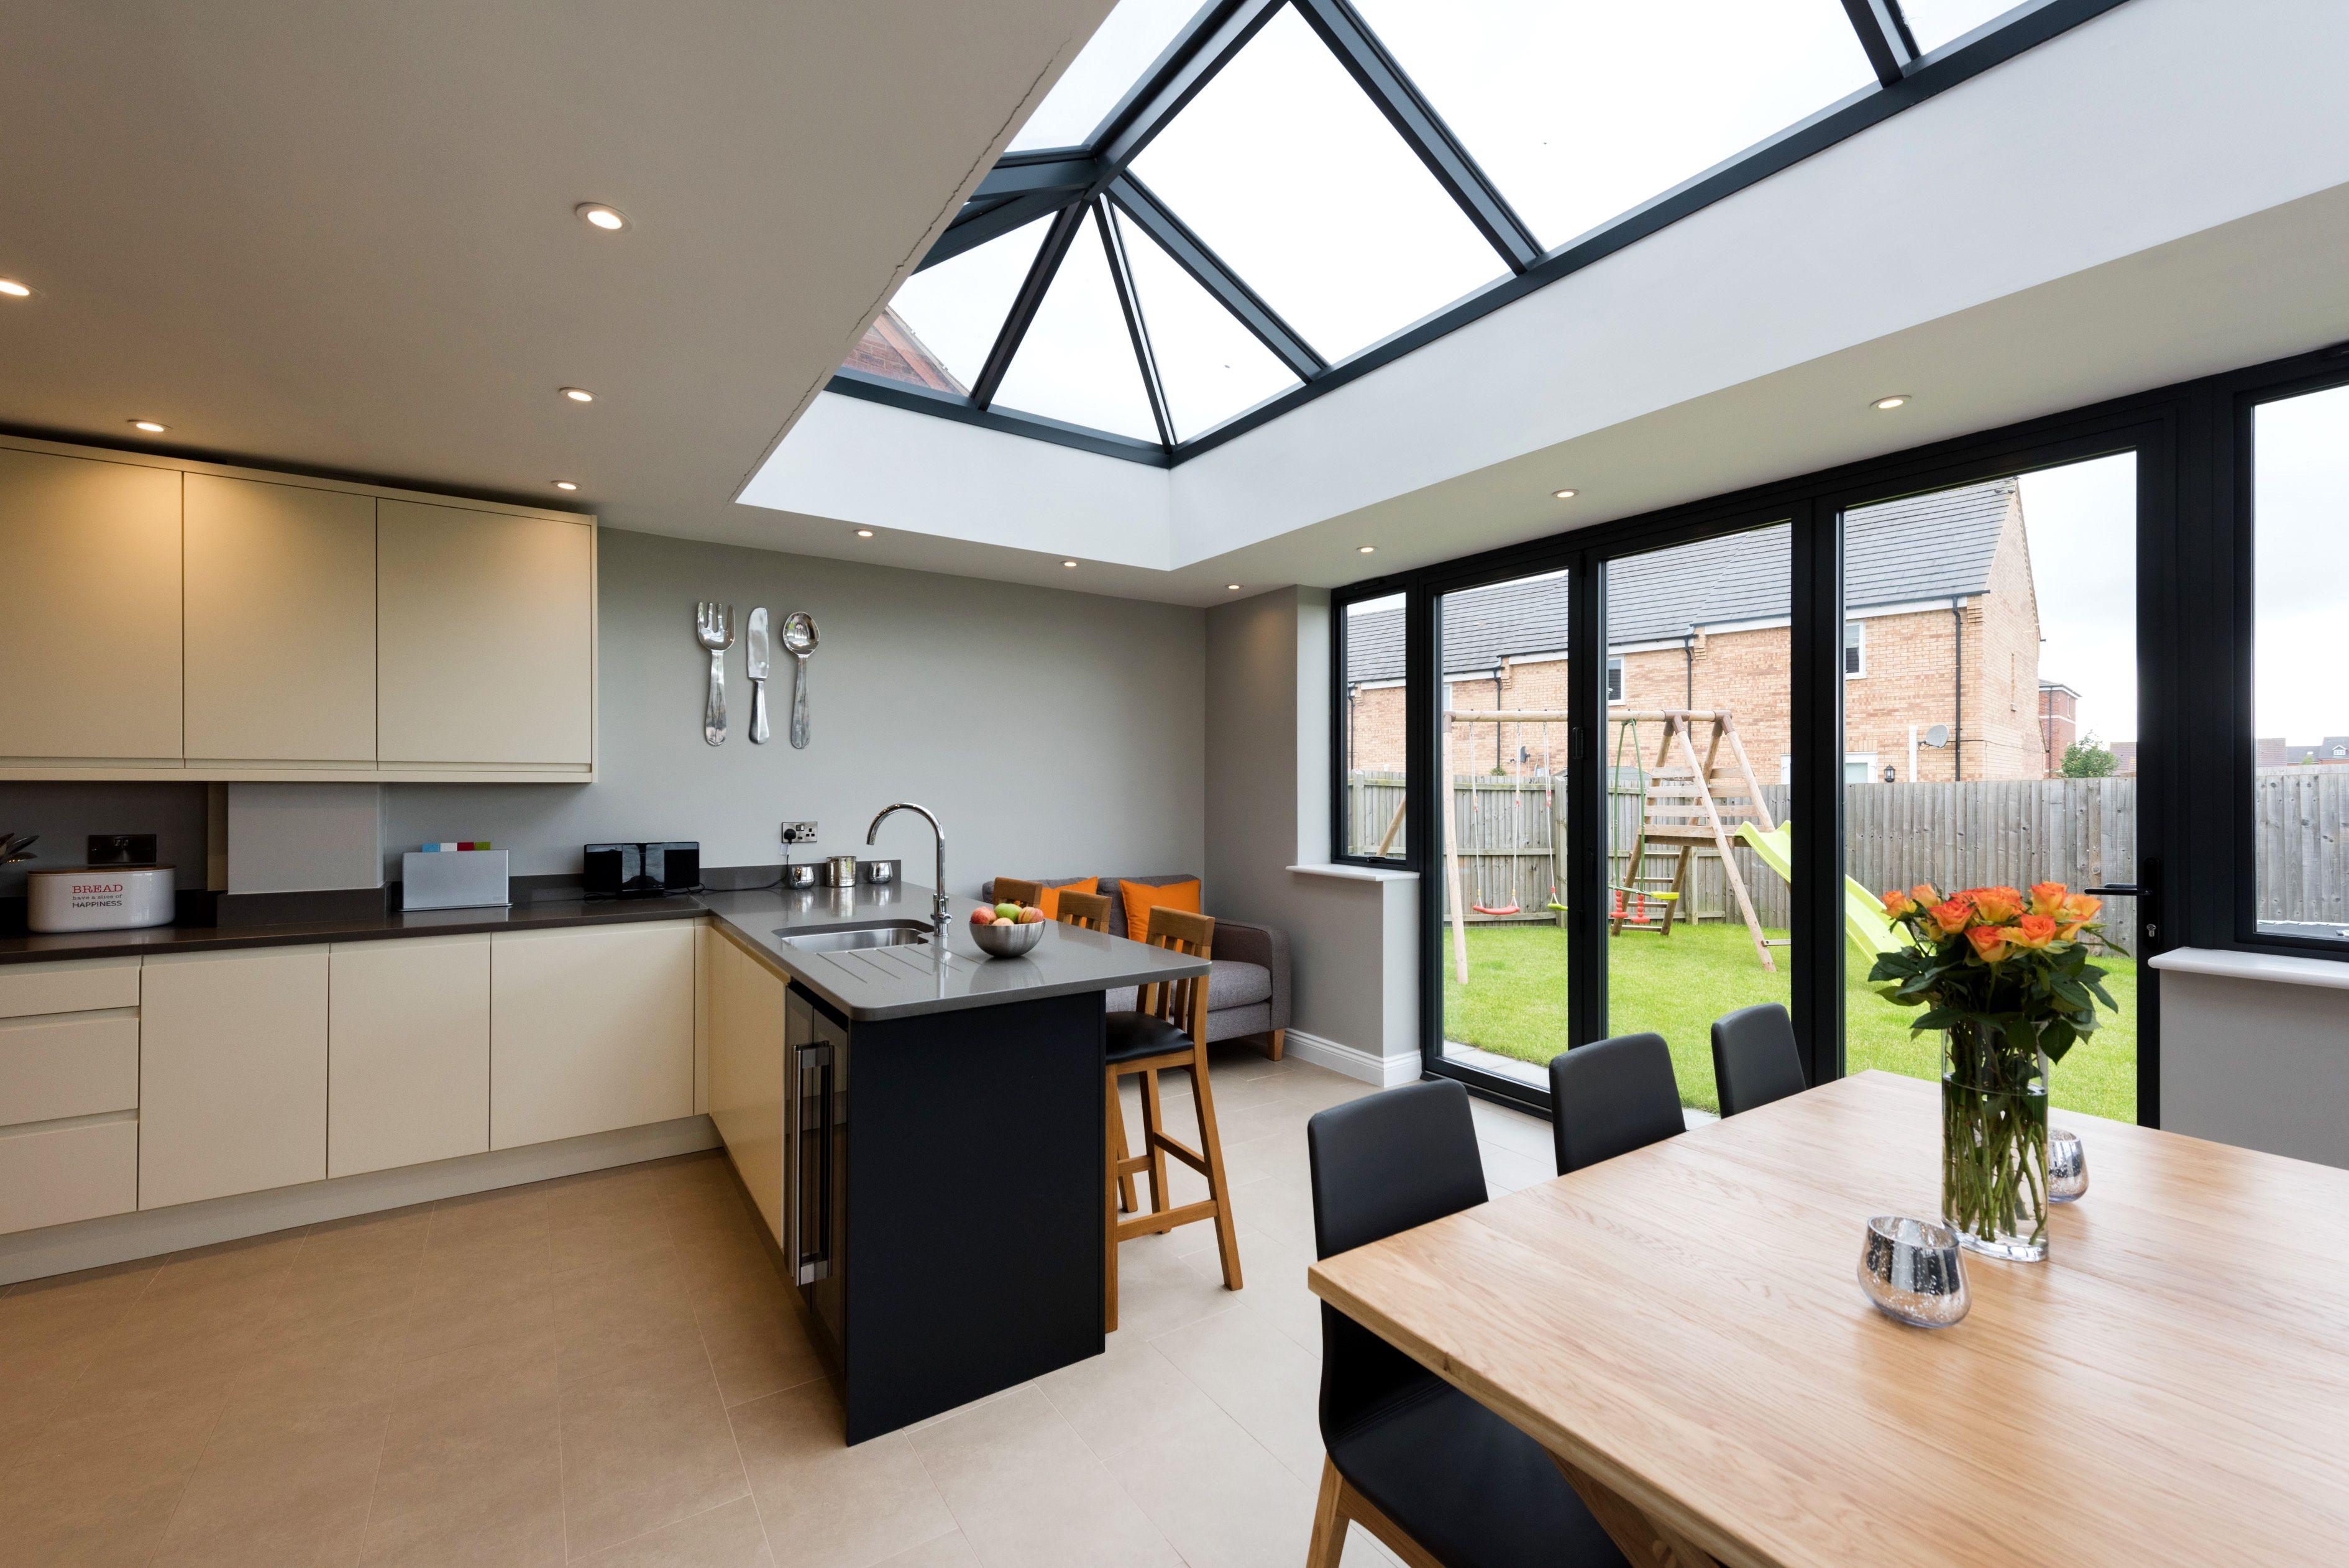 small kitchen extension ideas   Interior design kitchen ...